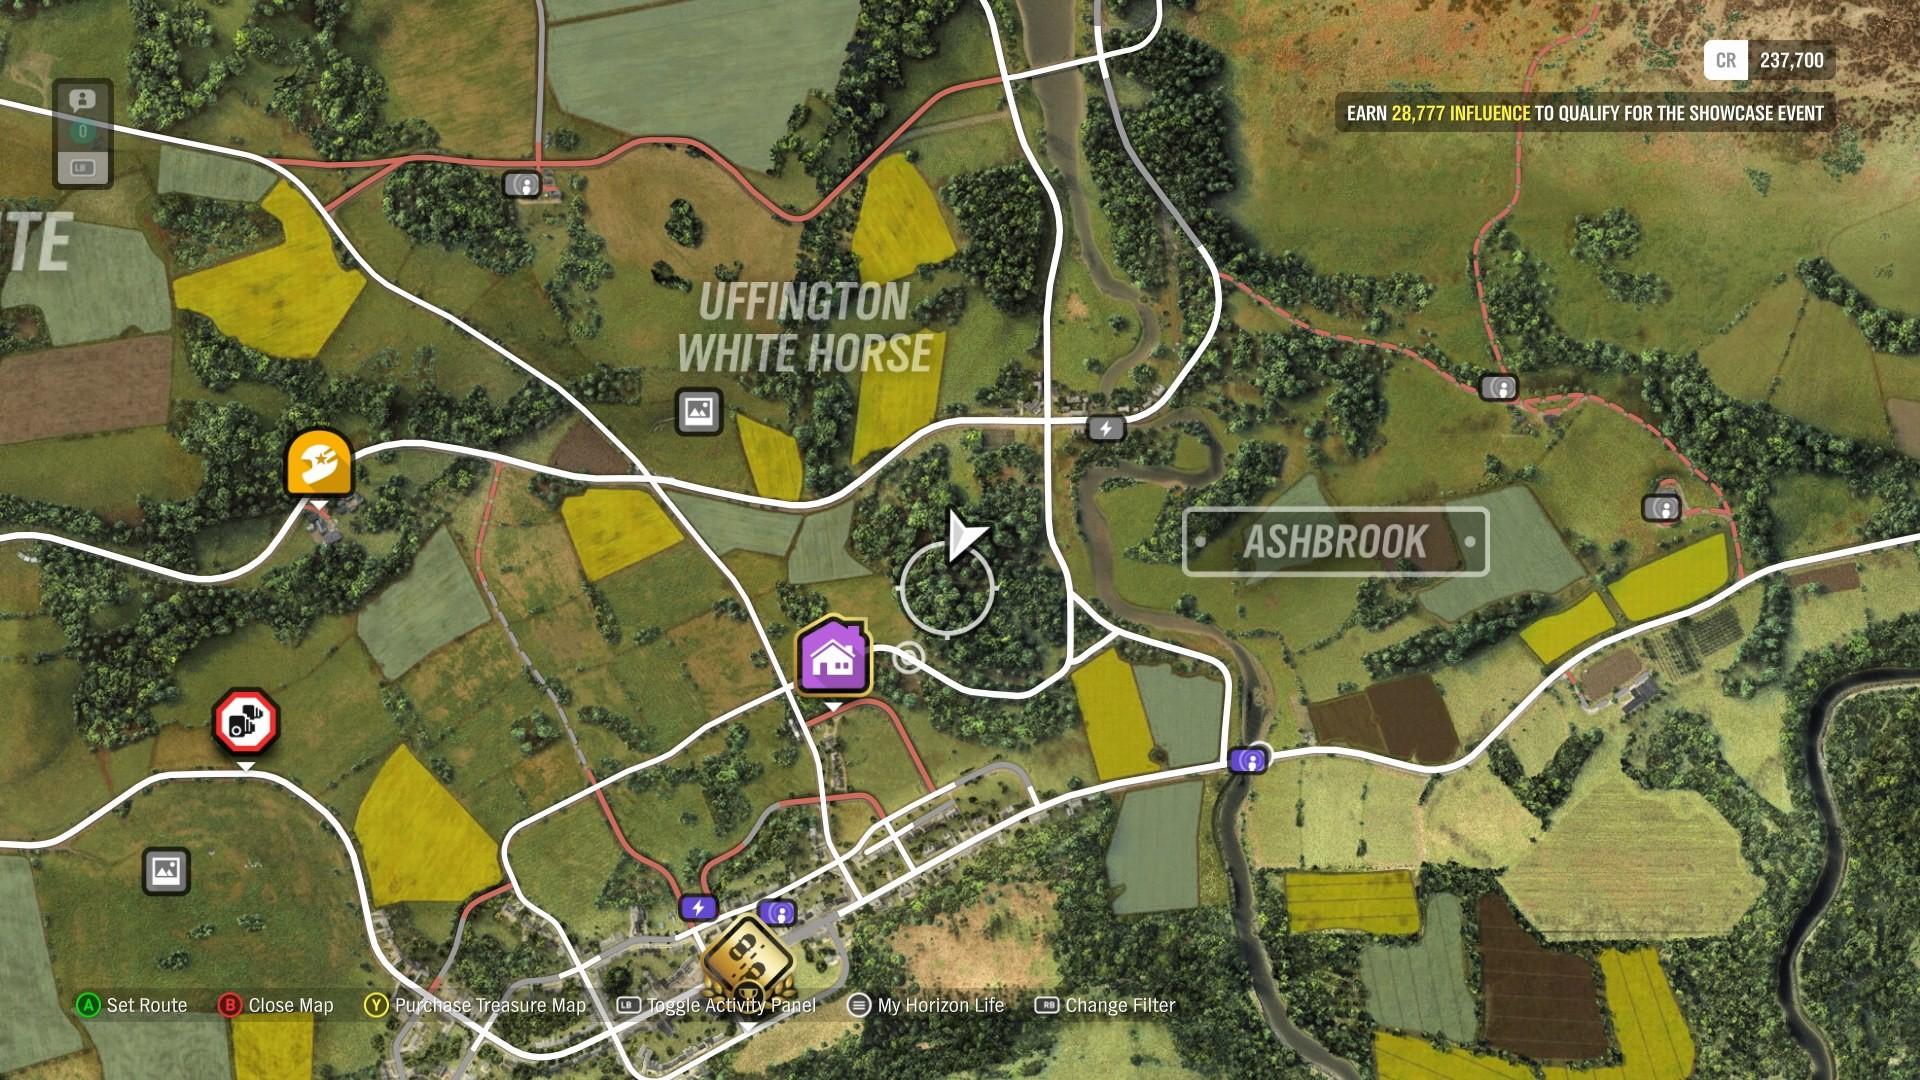 Artstation Forza Horizon 4 Broadway Ashbrook And Uffington White Horse Areas Razvan Prajanu